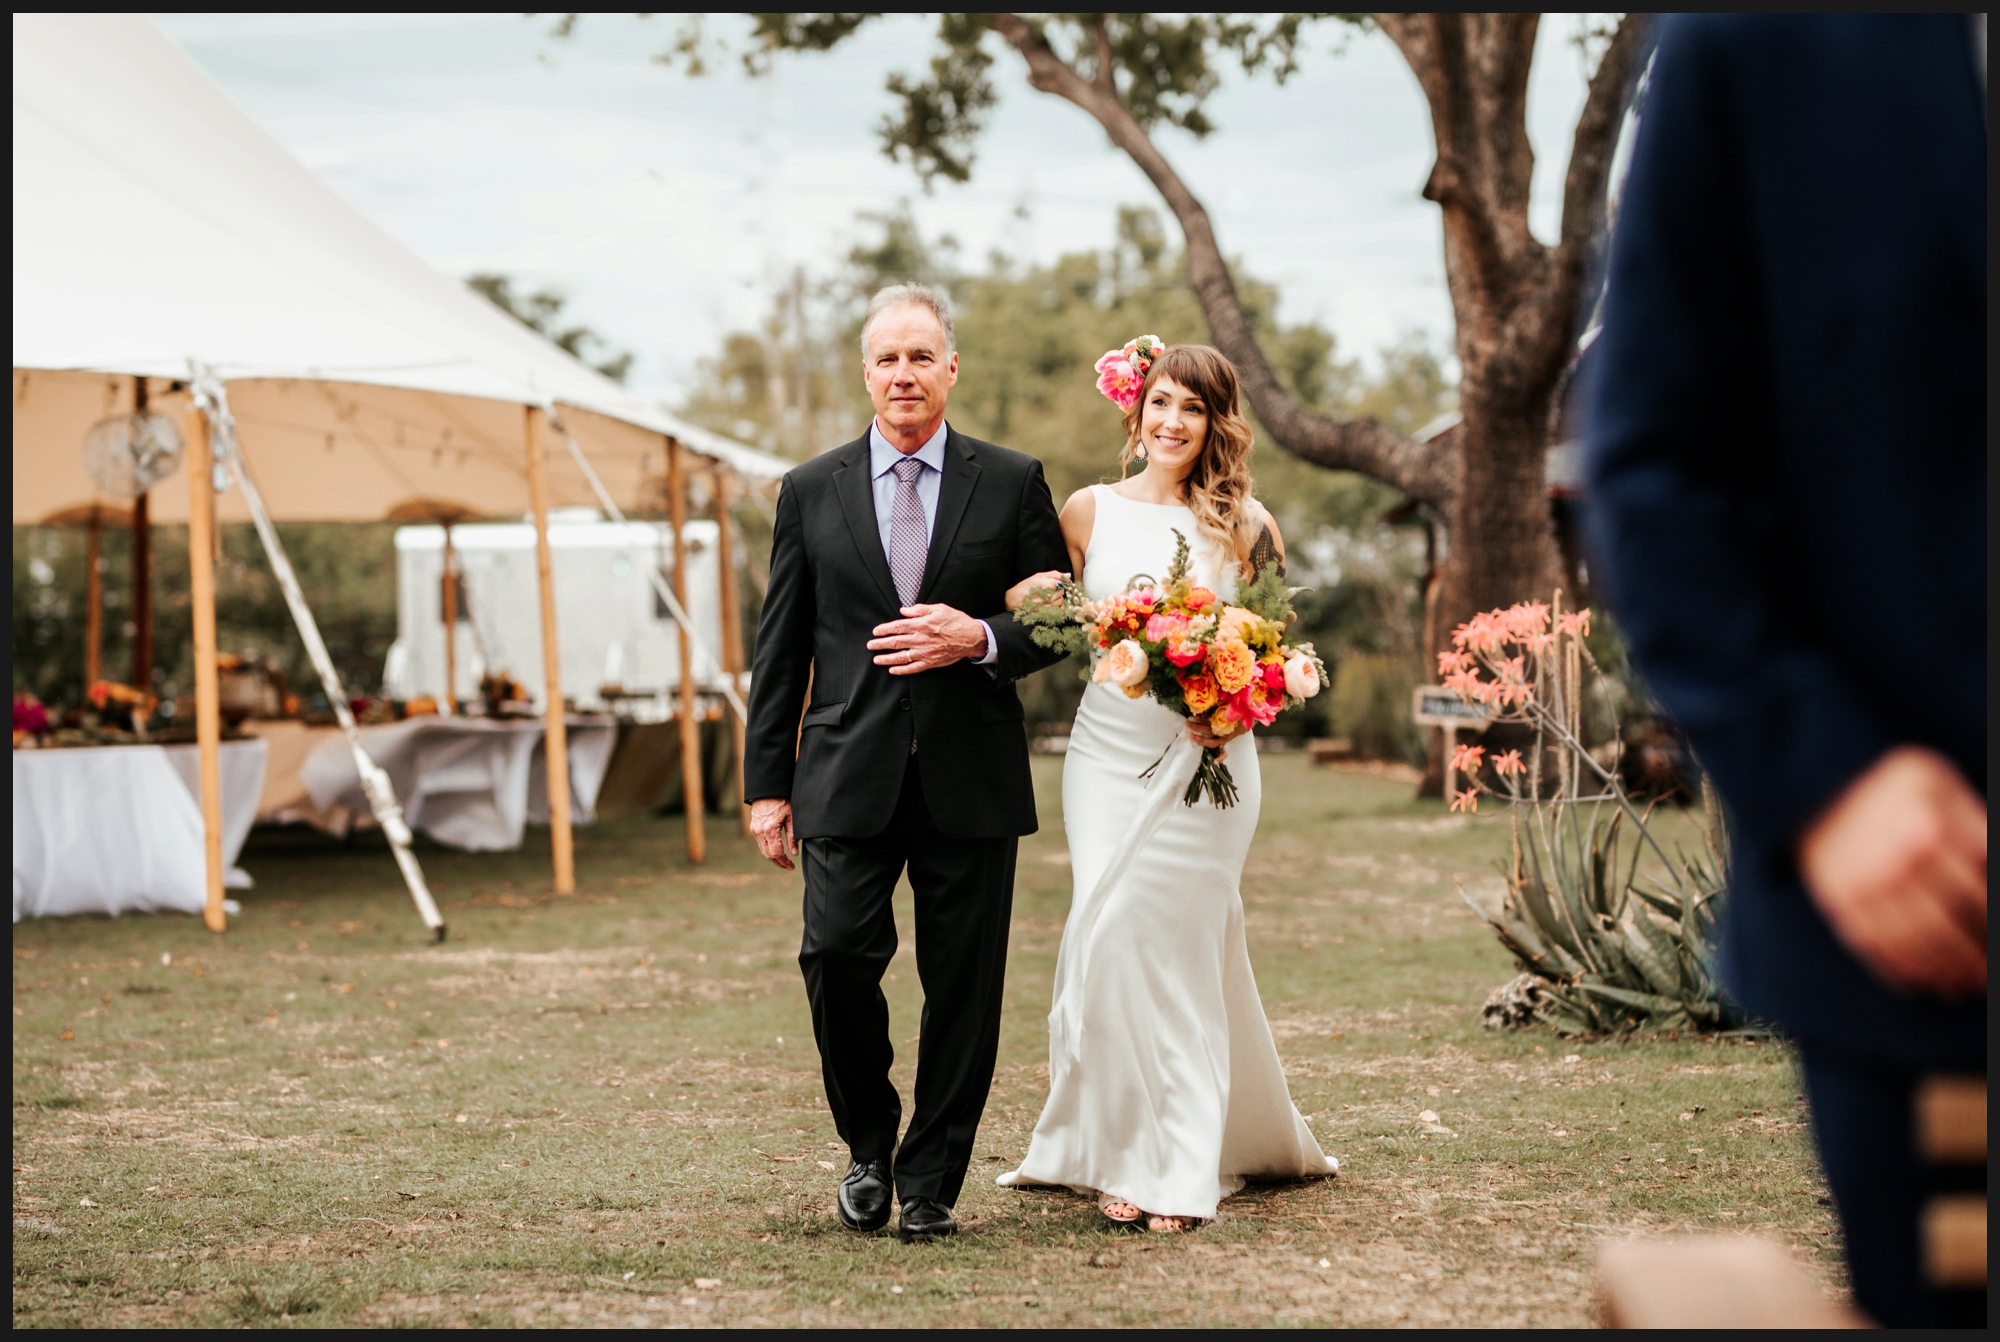 Orlando-Wedding-Photographer-destination-wedding-photographer-florida-wedding-photographer-bohemian-wedding-photographer_2002.jpg